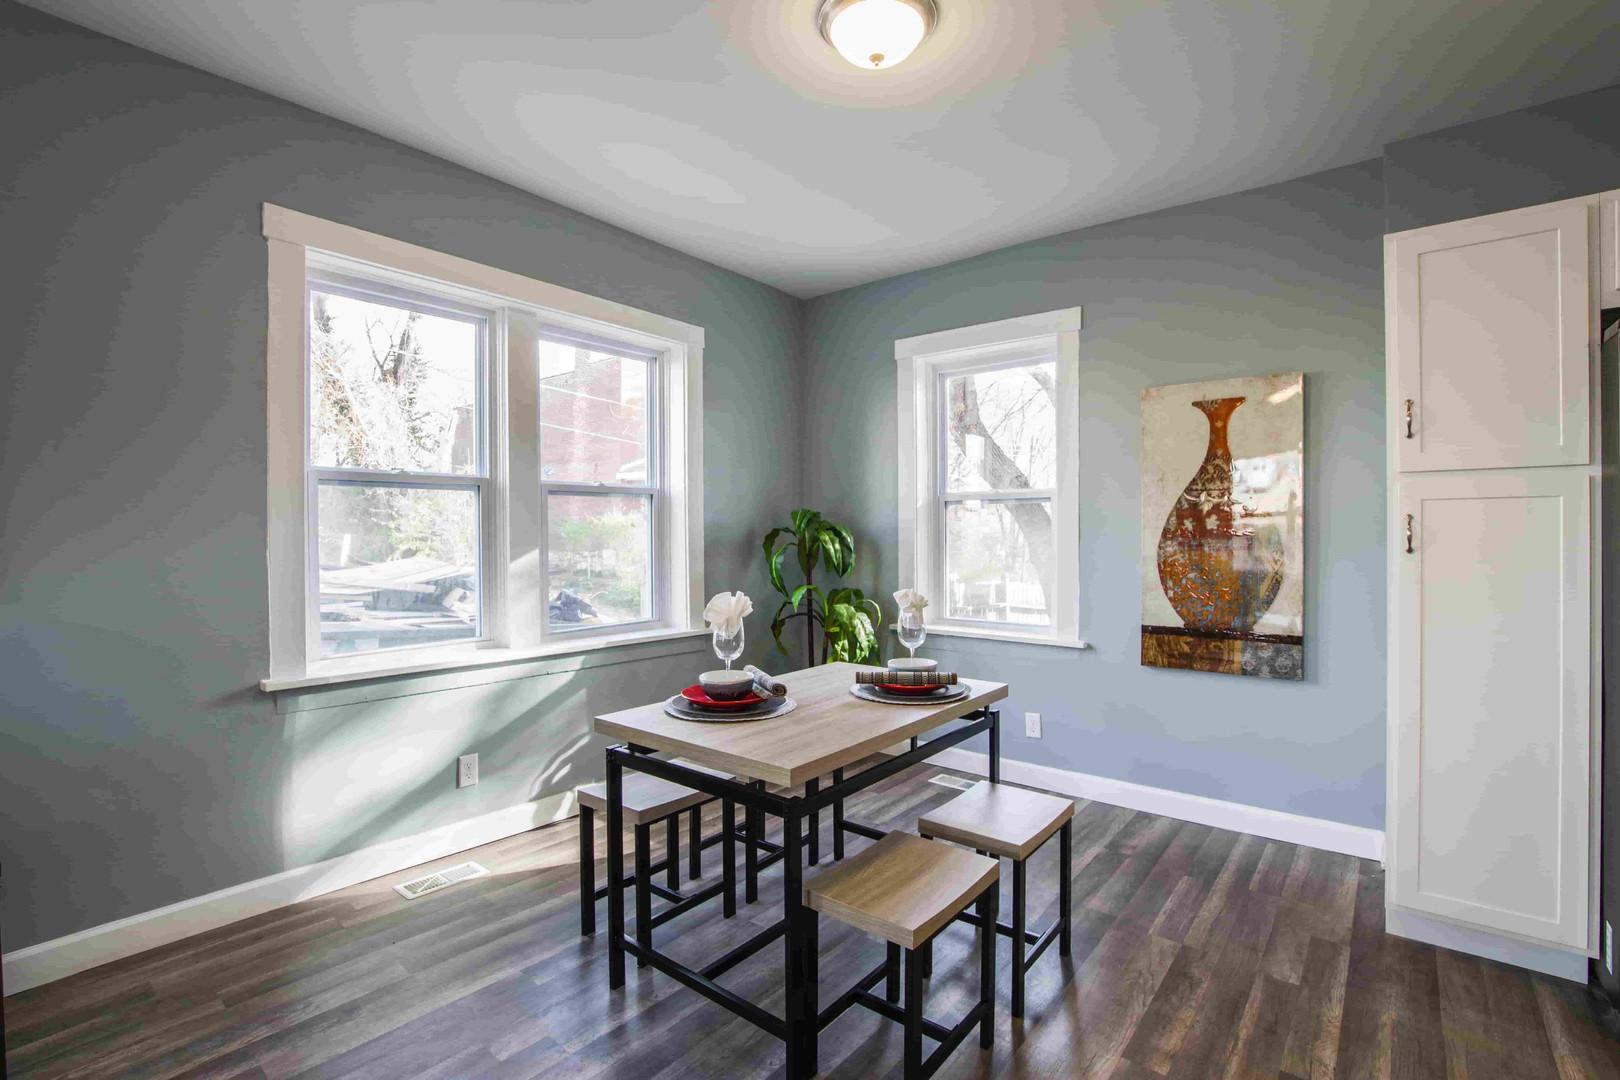 ceiling-daylight-dining-room-1663264-min